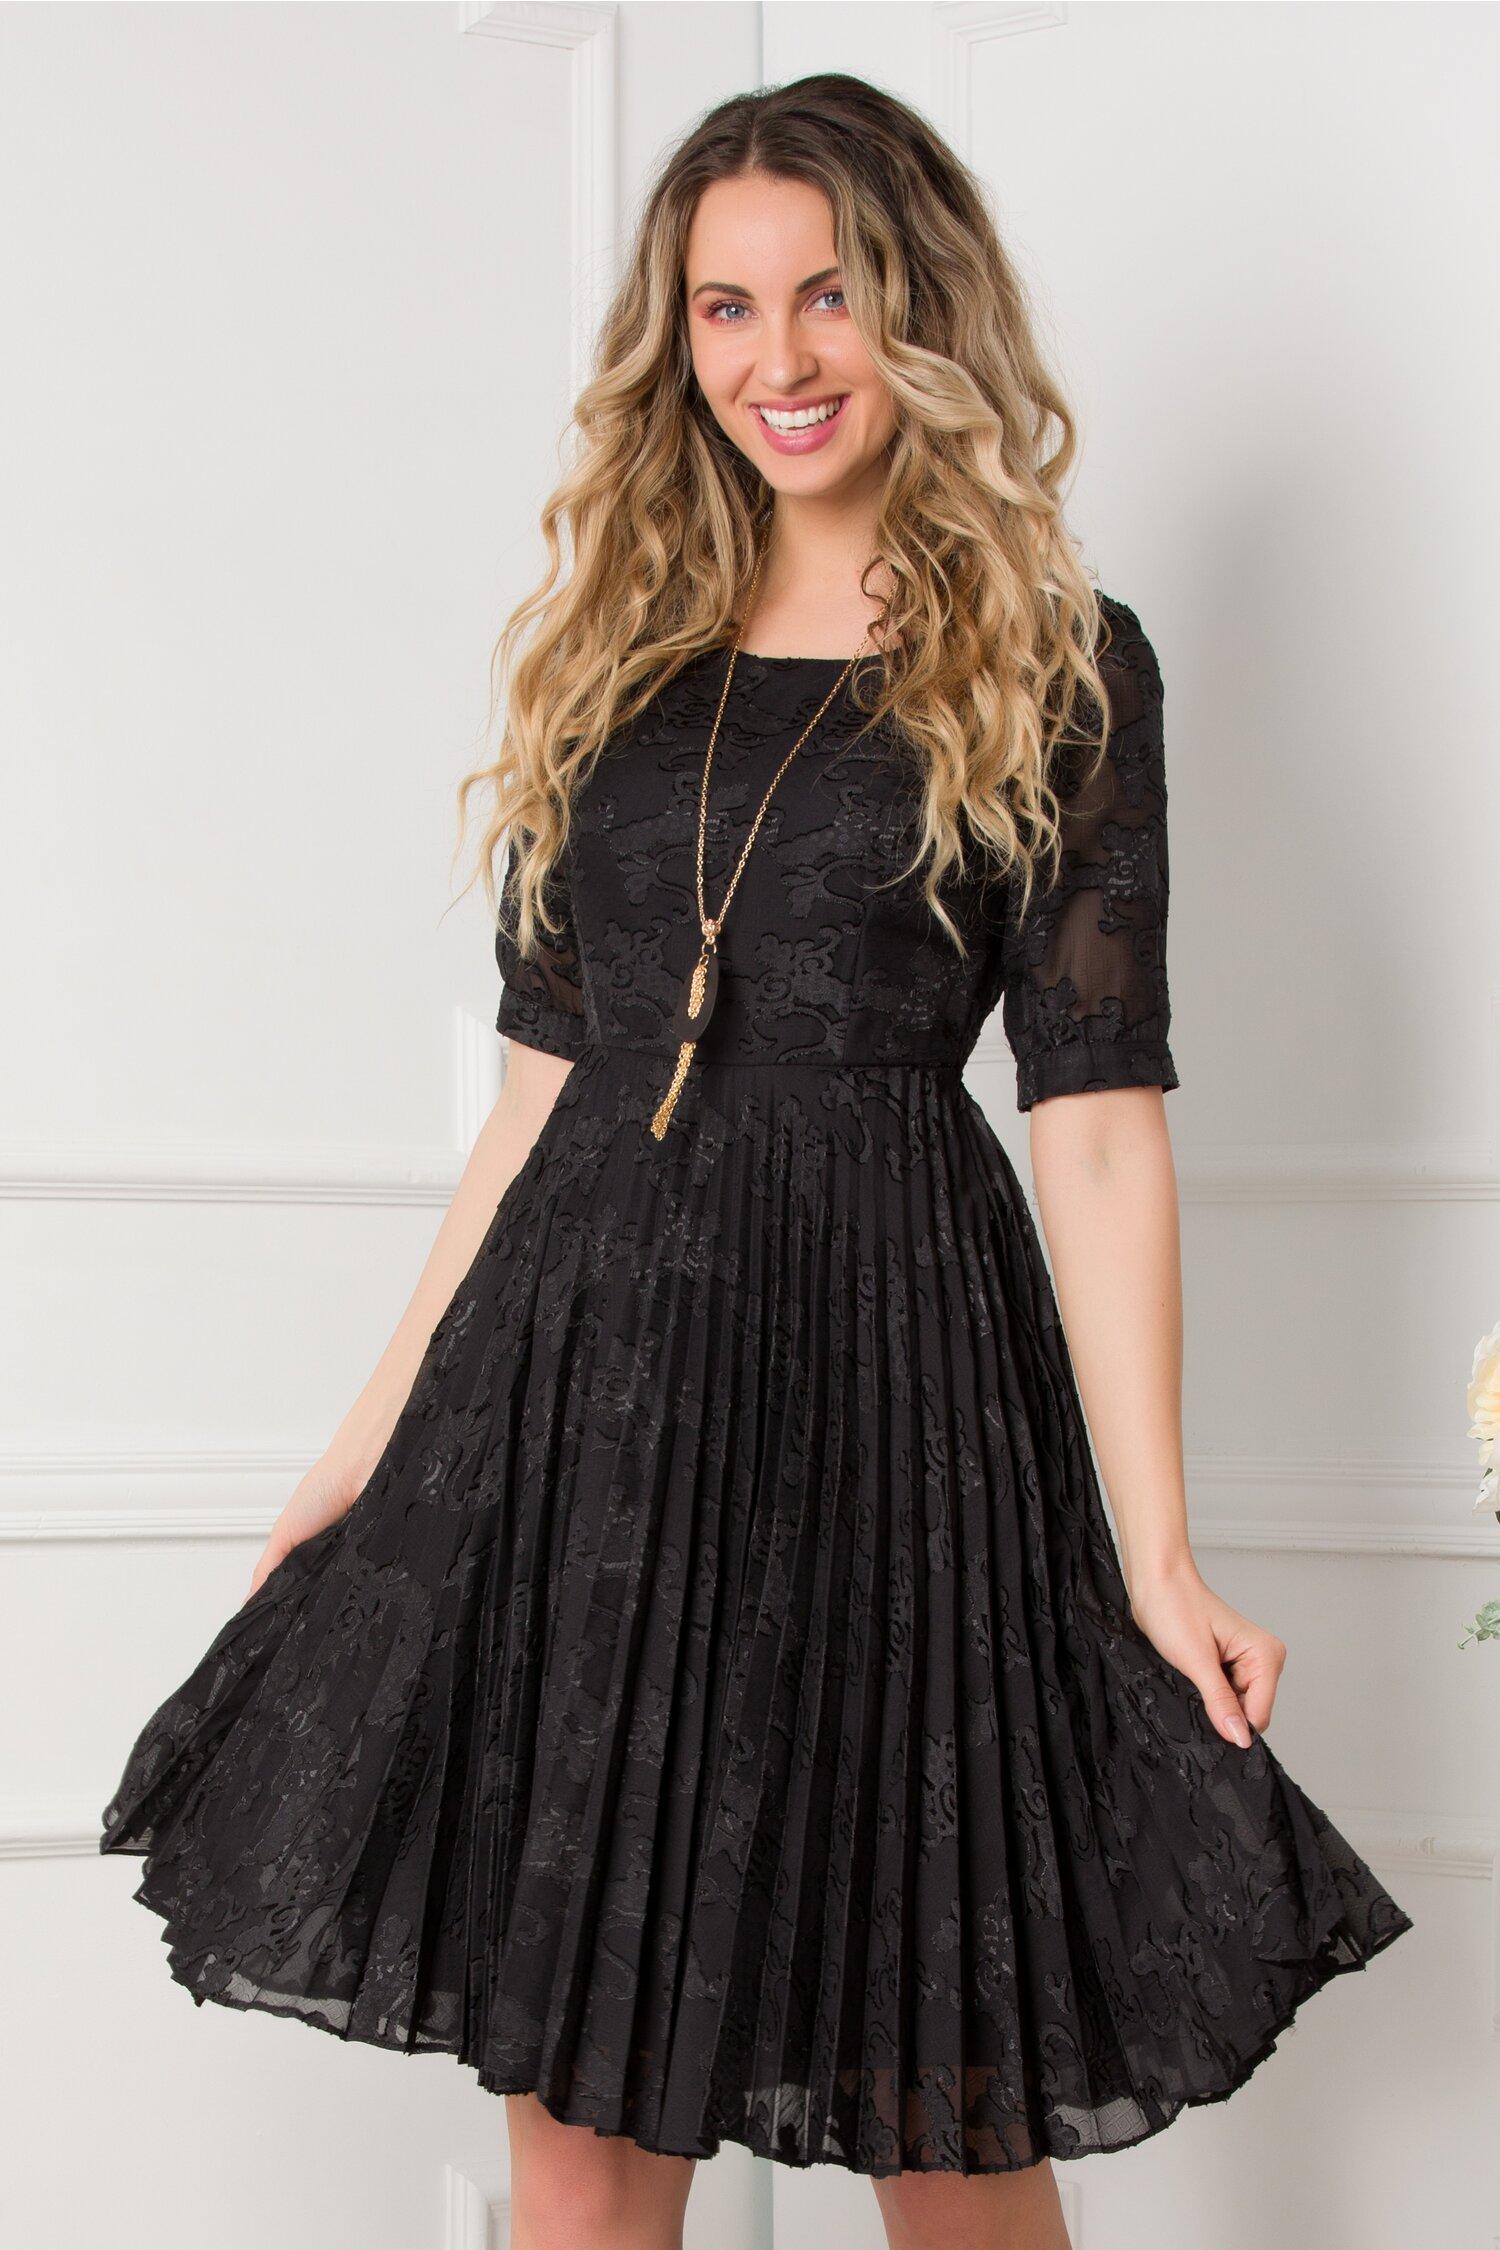 Rochie Mikaela neagra cu model deosebit si pliuri